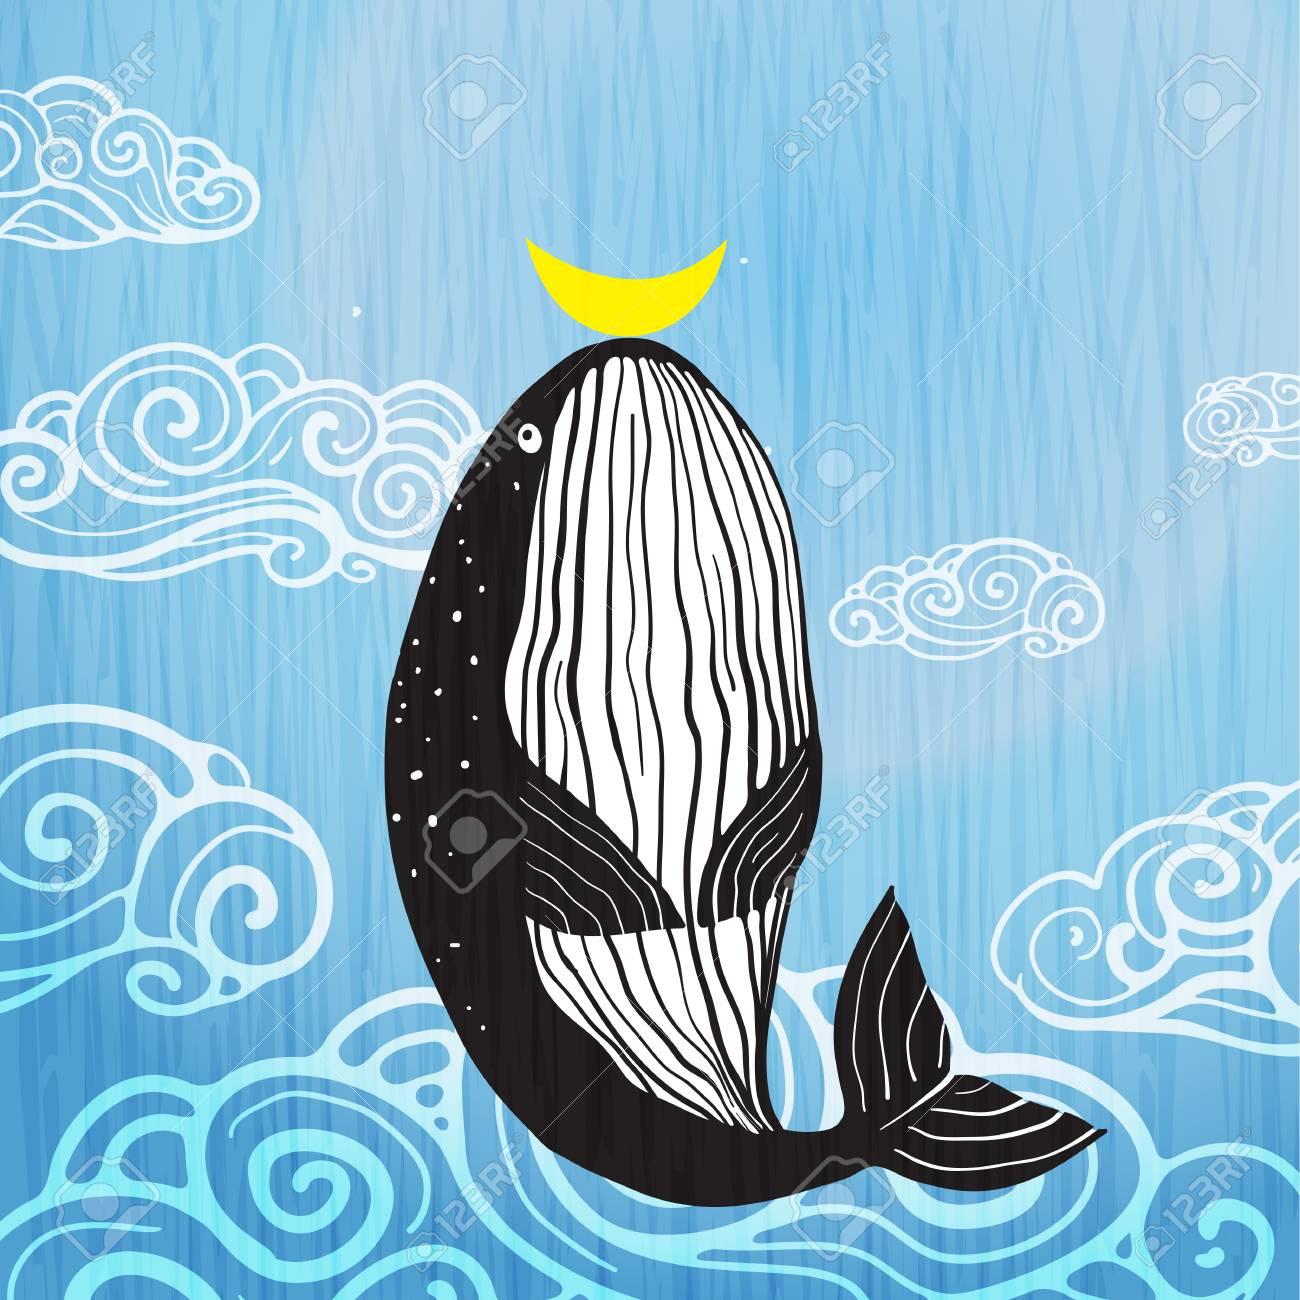 Cute Whale moon and ocean print design. Vector illustration. - 112344678